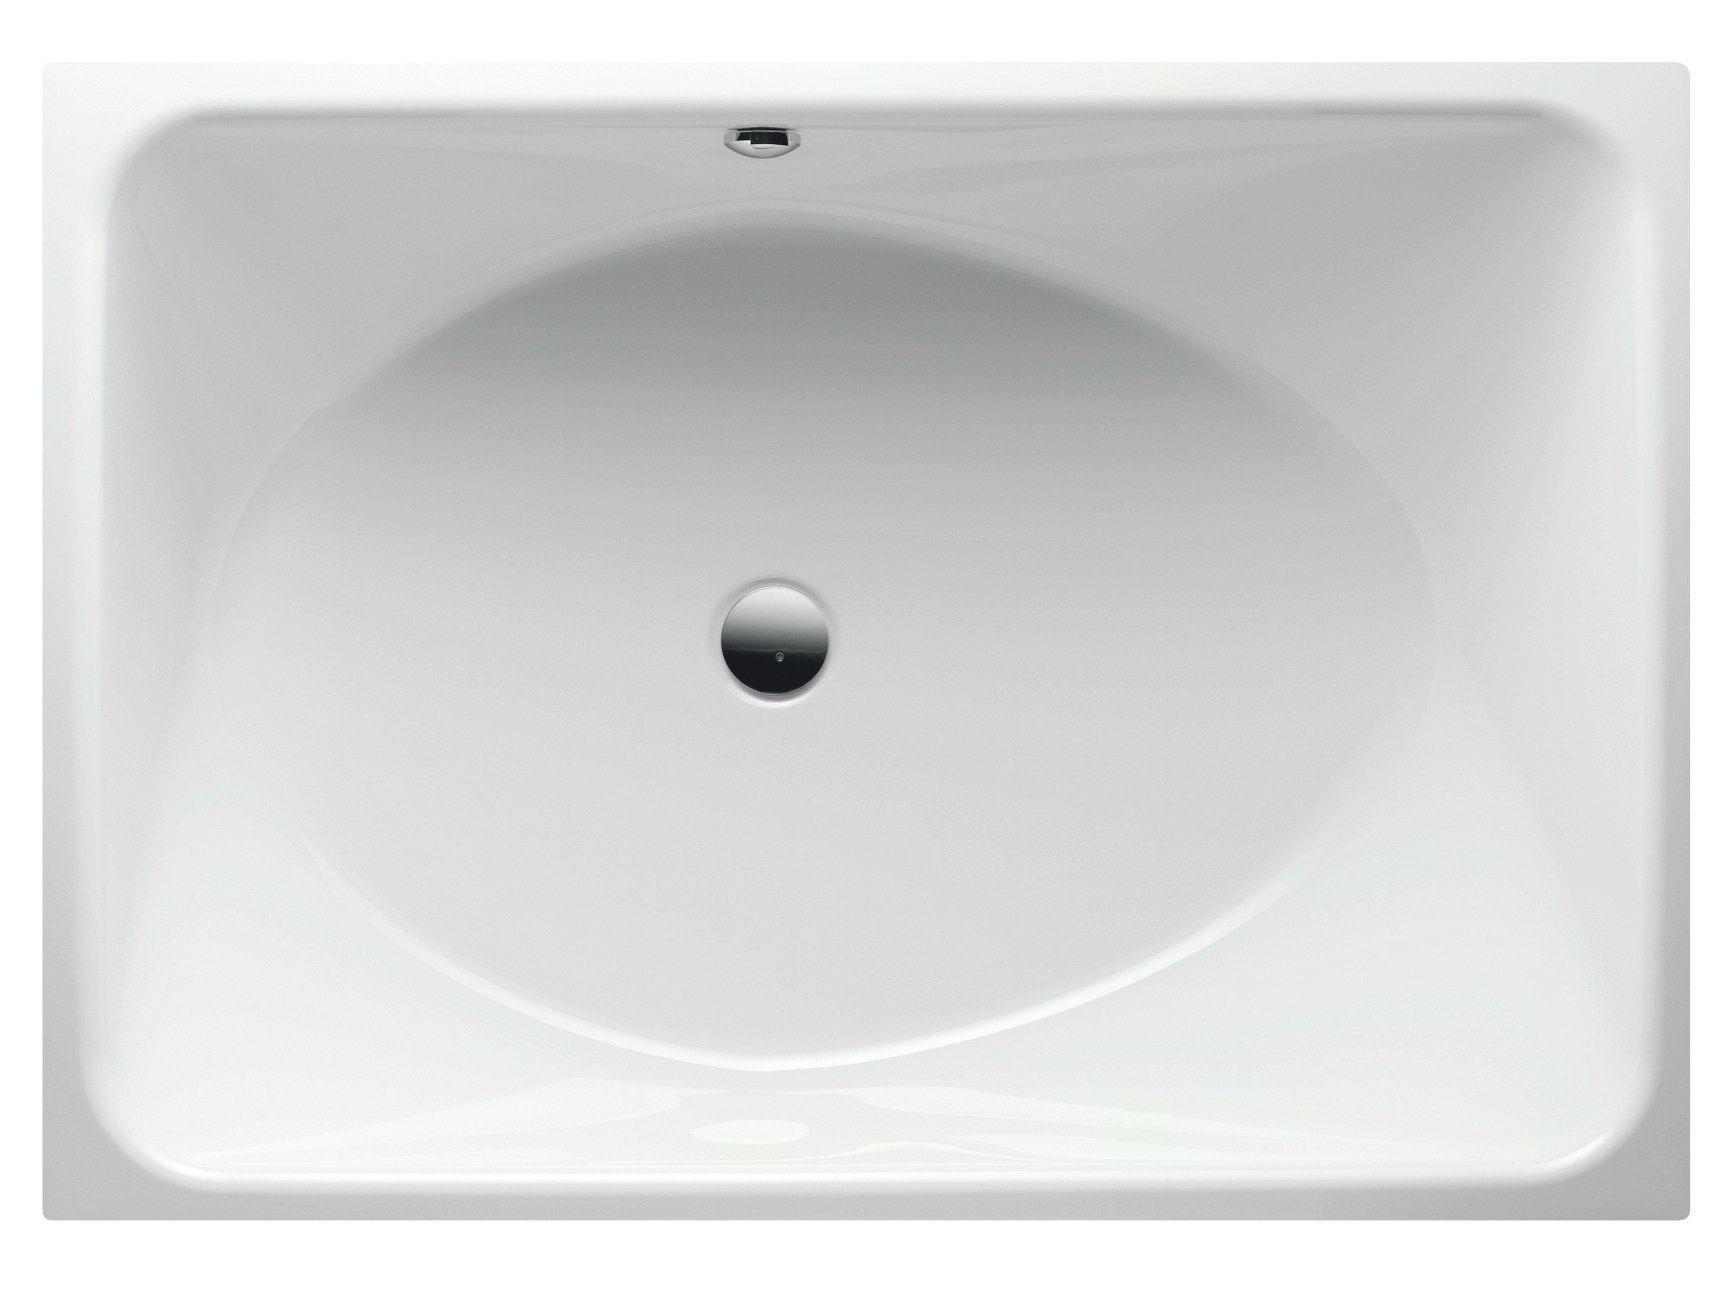 Bettespa vasca da bagno a 2 posti by bette design schmiddem design - Vasche da bagno in acciaio smaltato ...